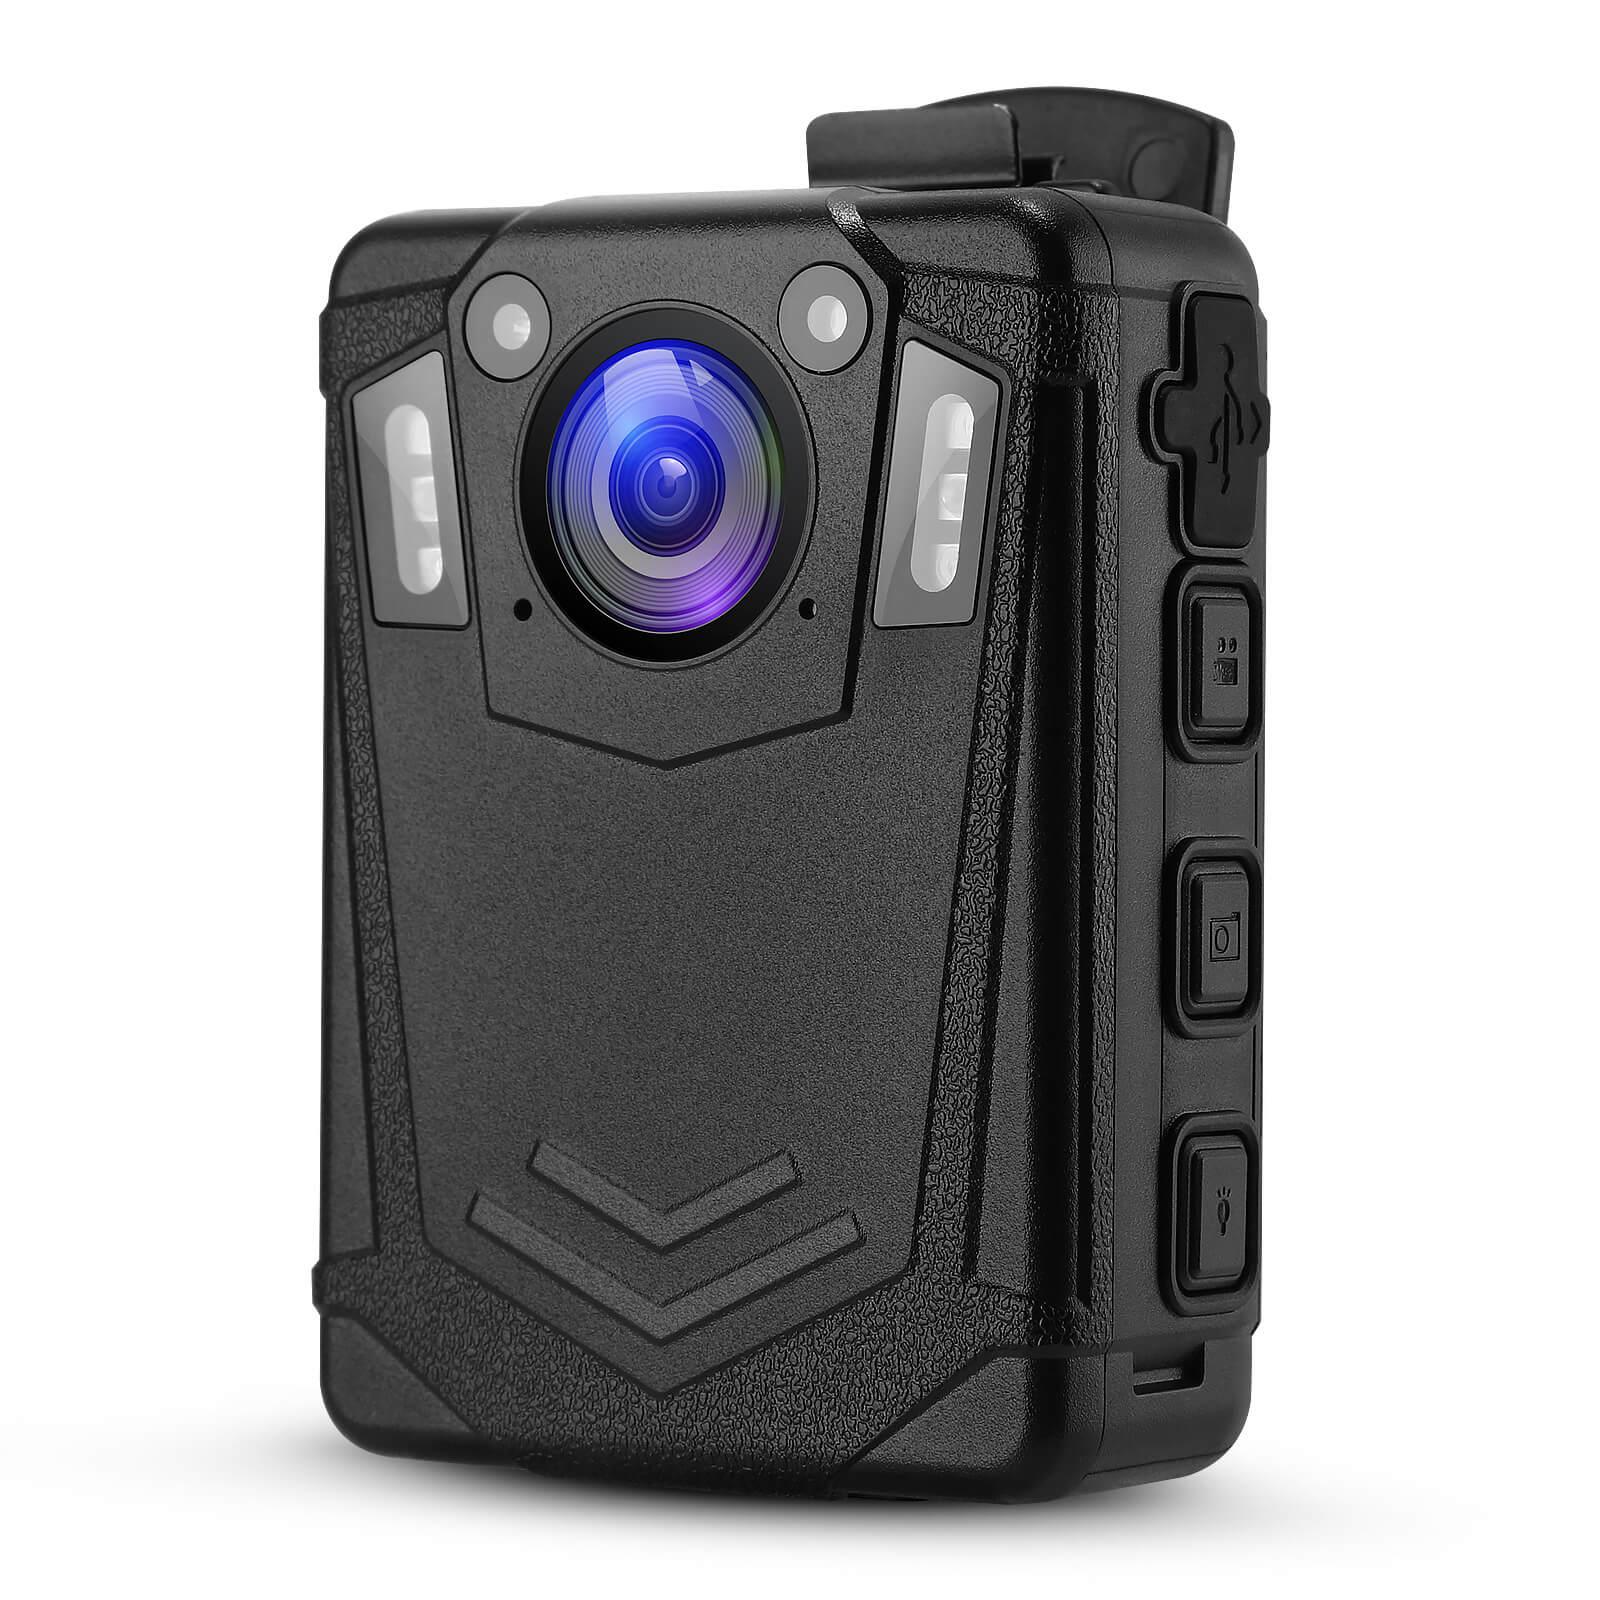 BOBLOV-Cámara de policía portátil DMT204 HD, 1080P, IP65, seguridad impermeable, Mini videocámaras